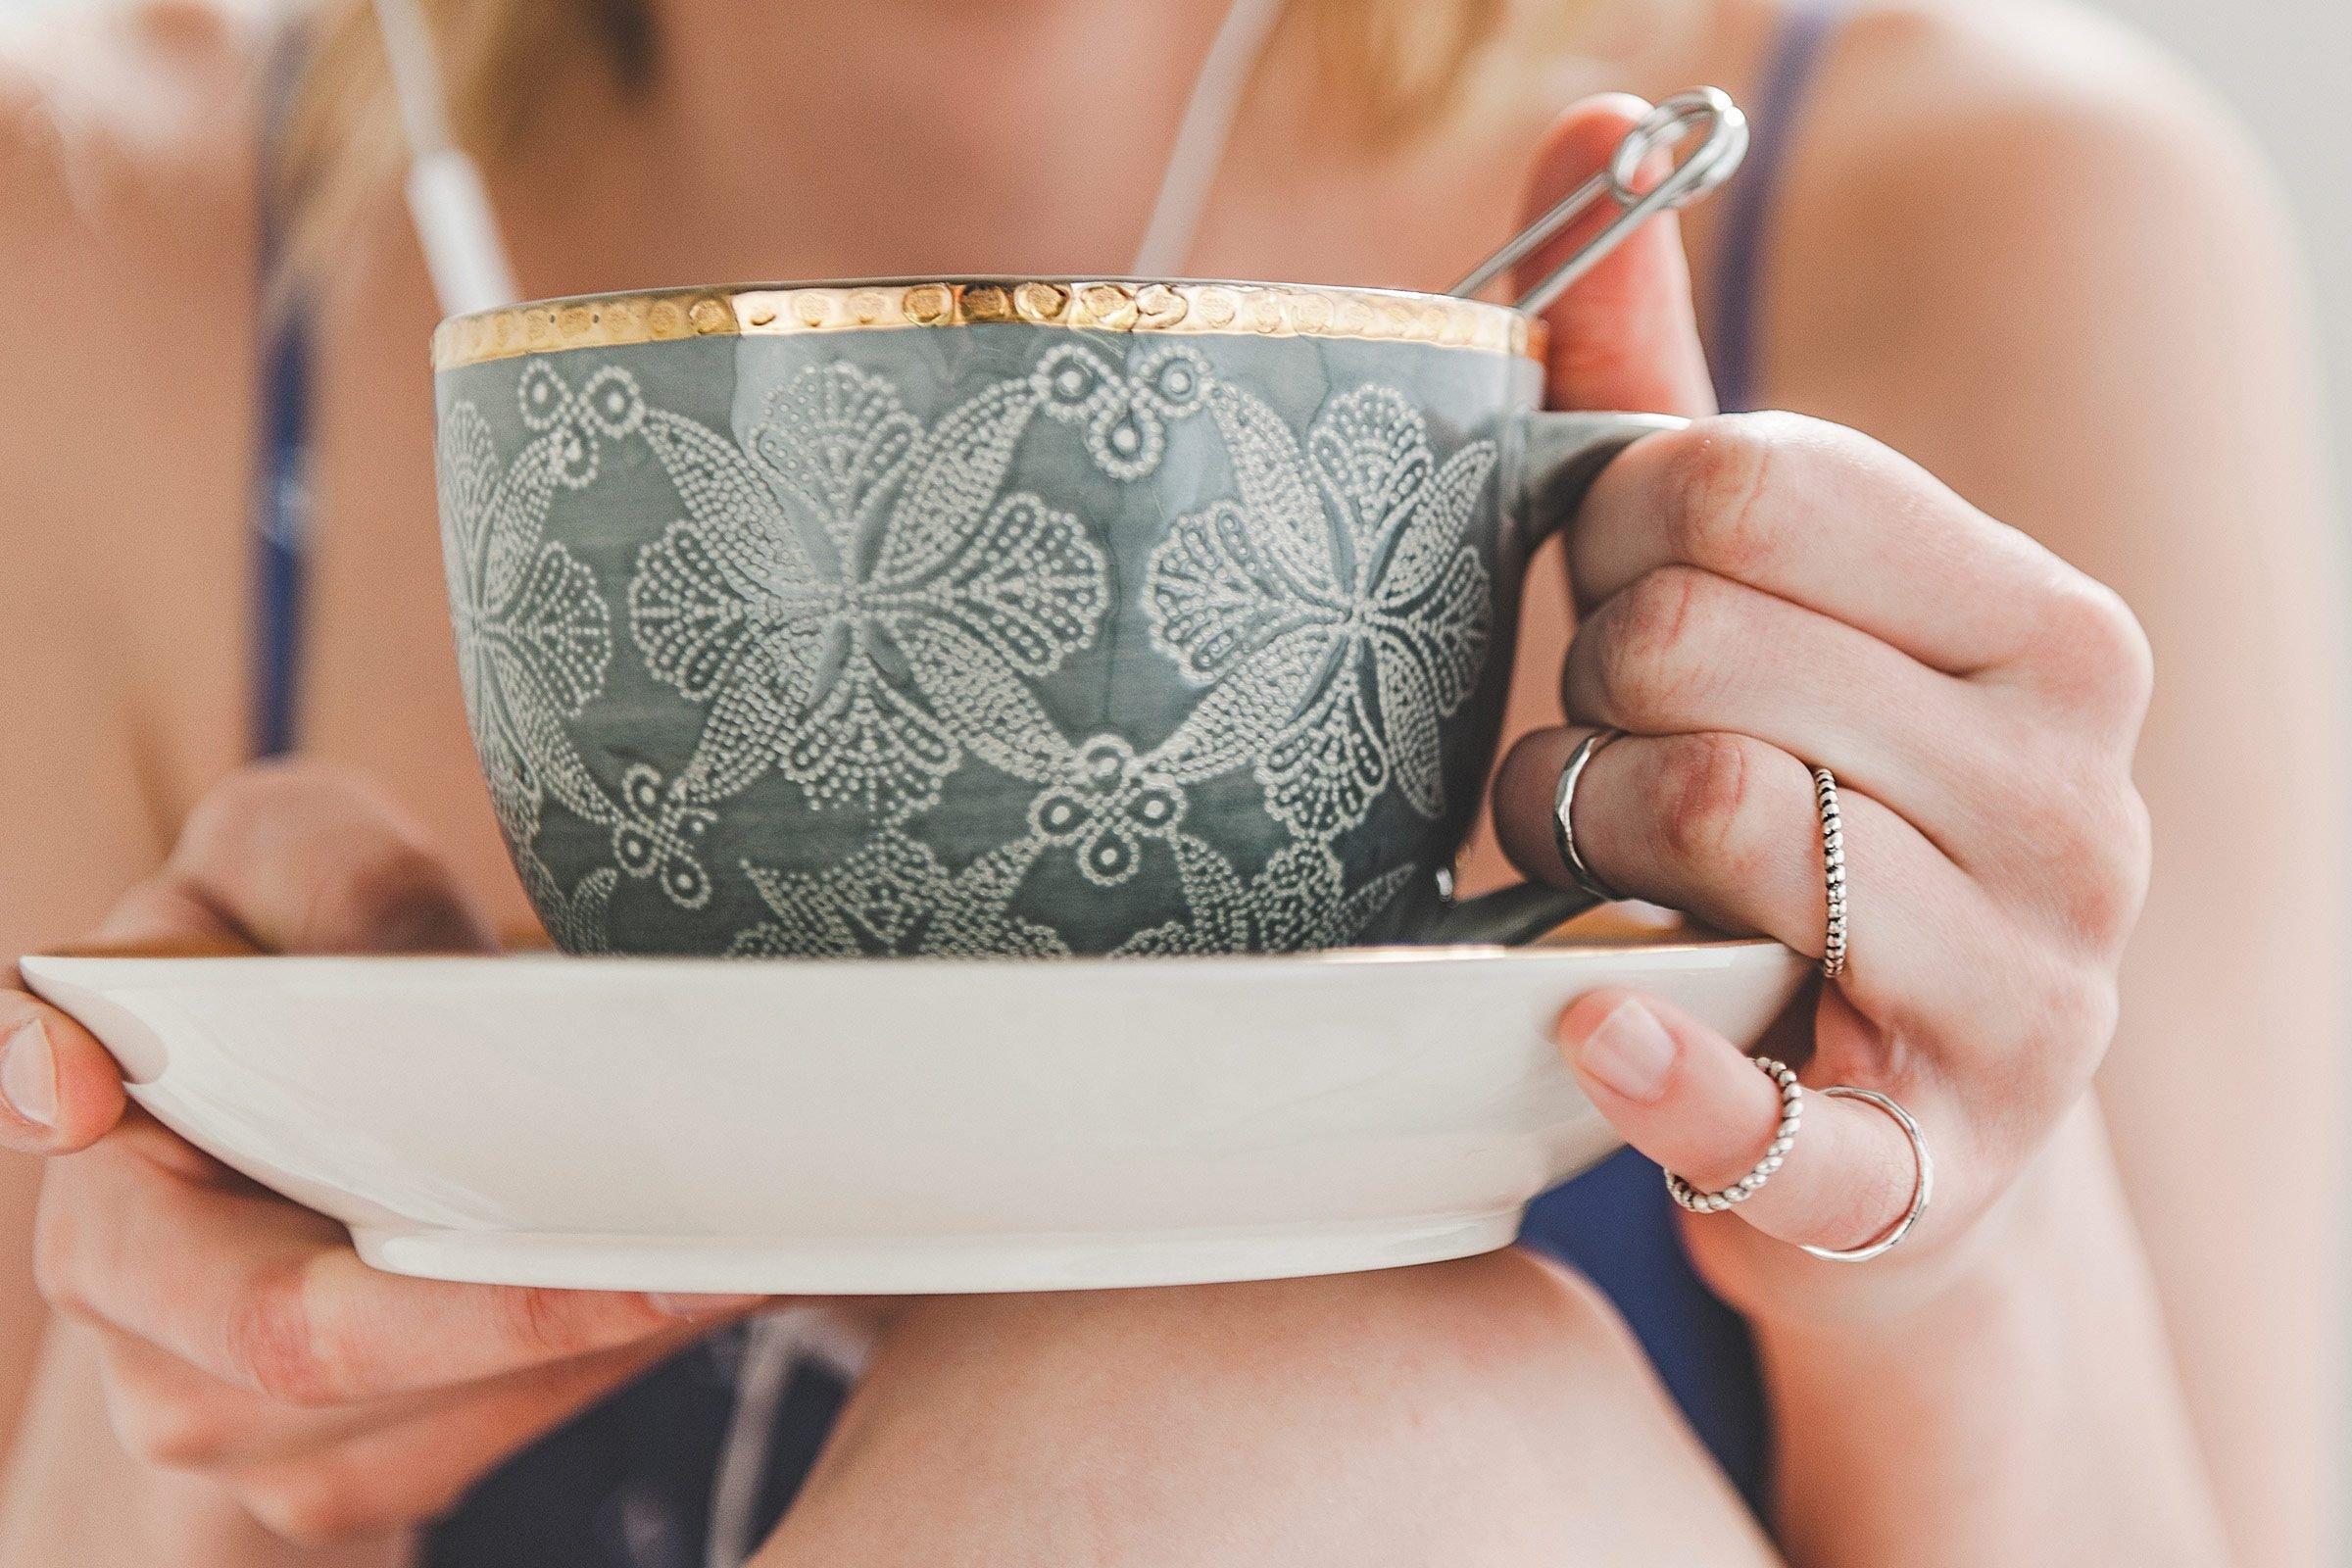 4. Coffee or tea?